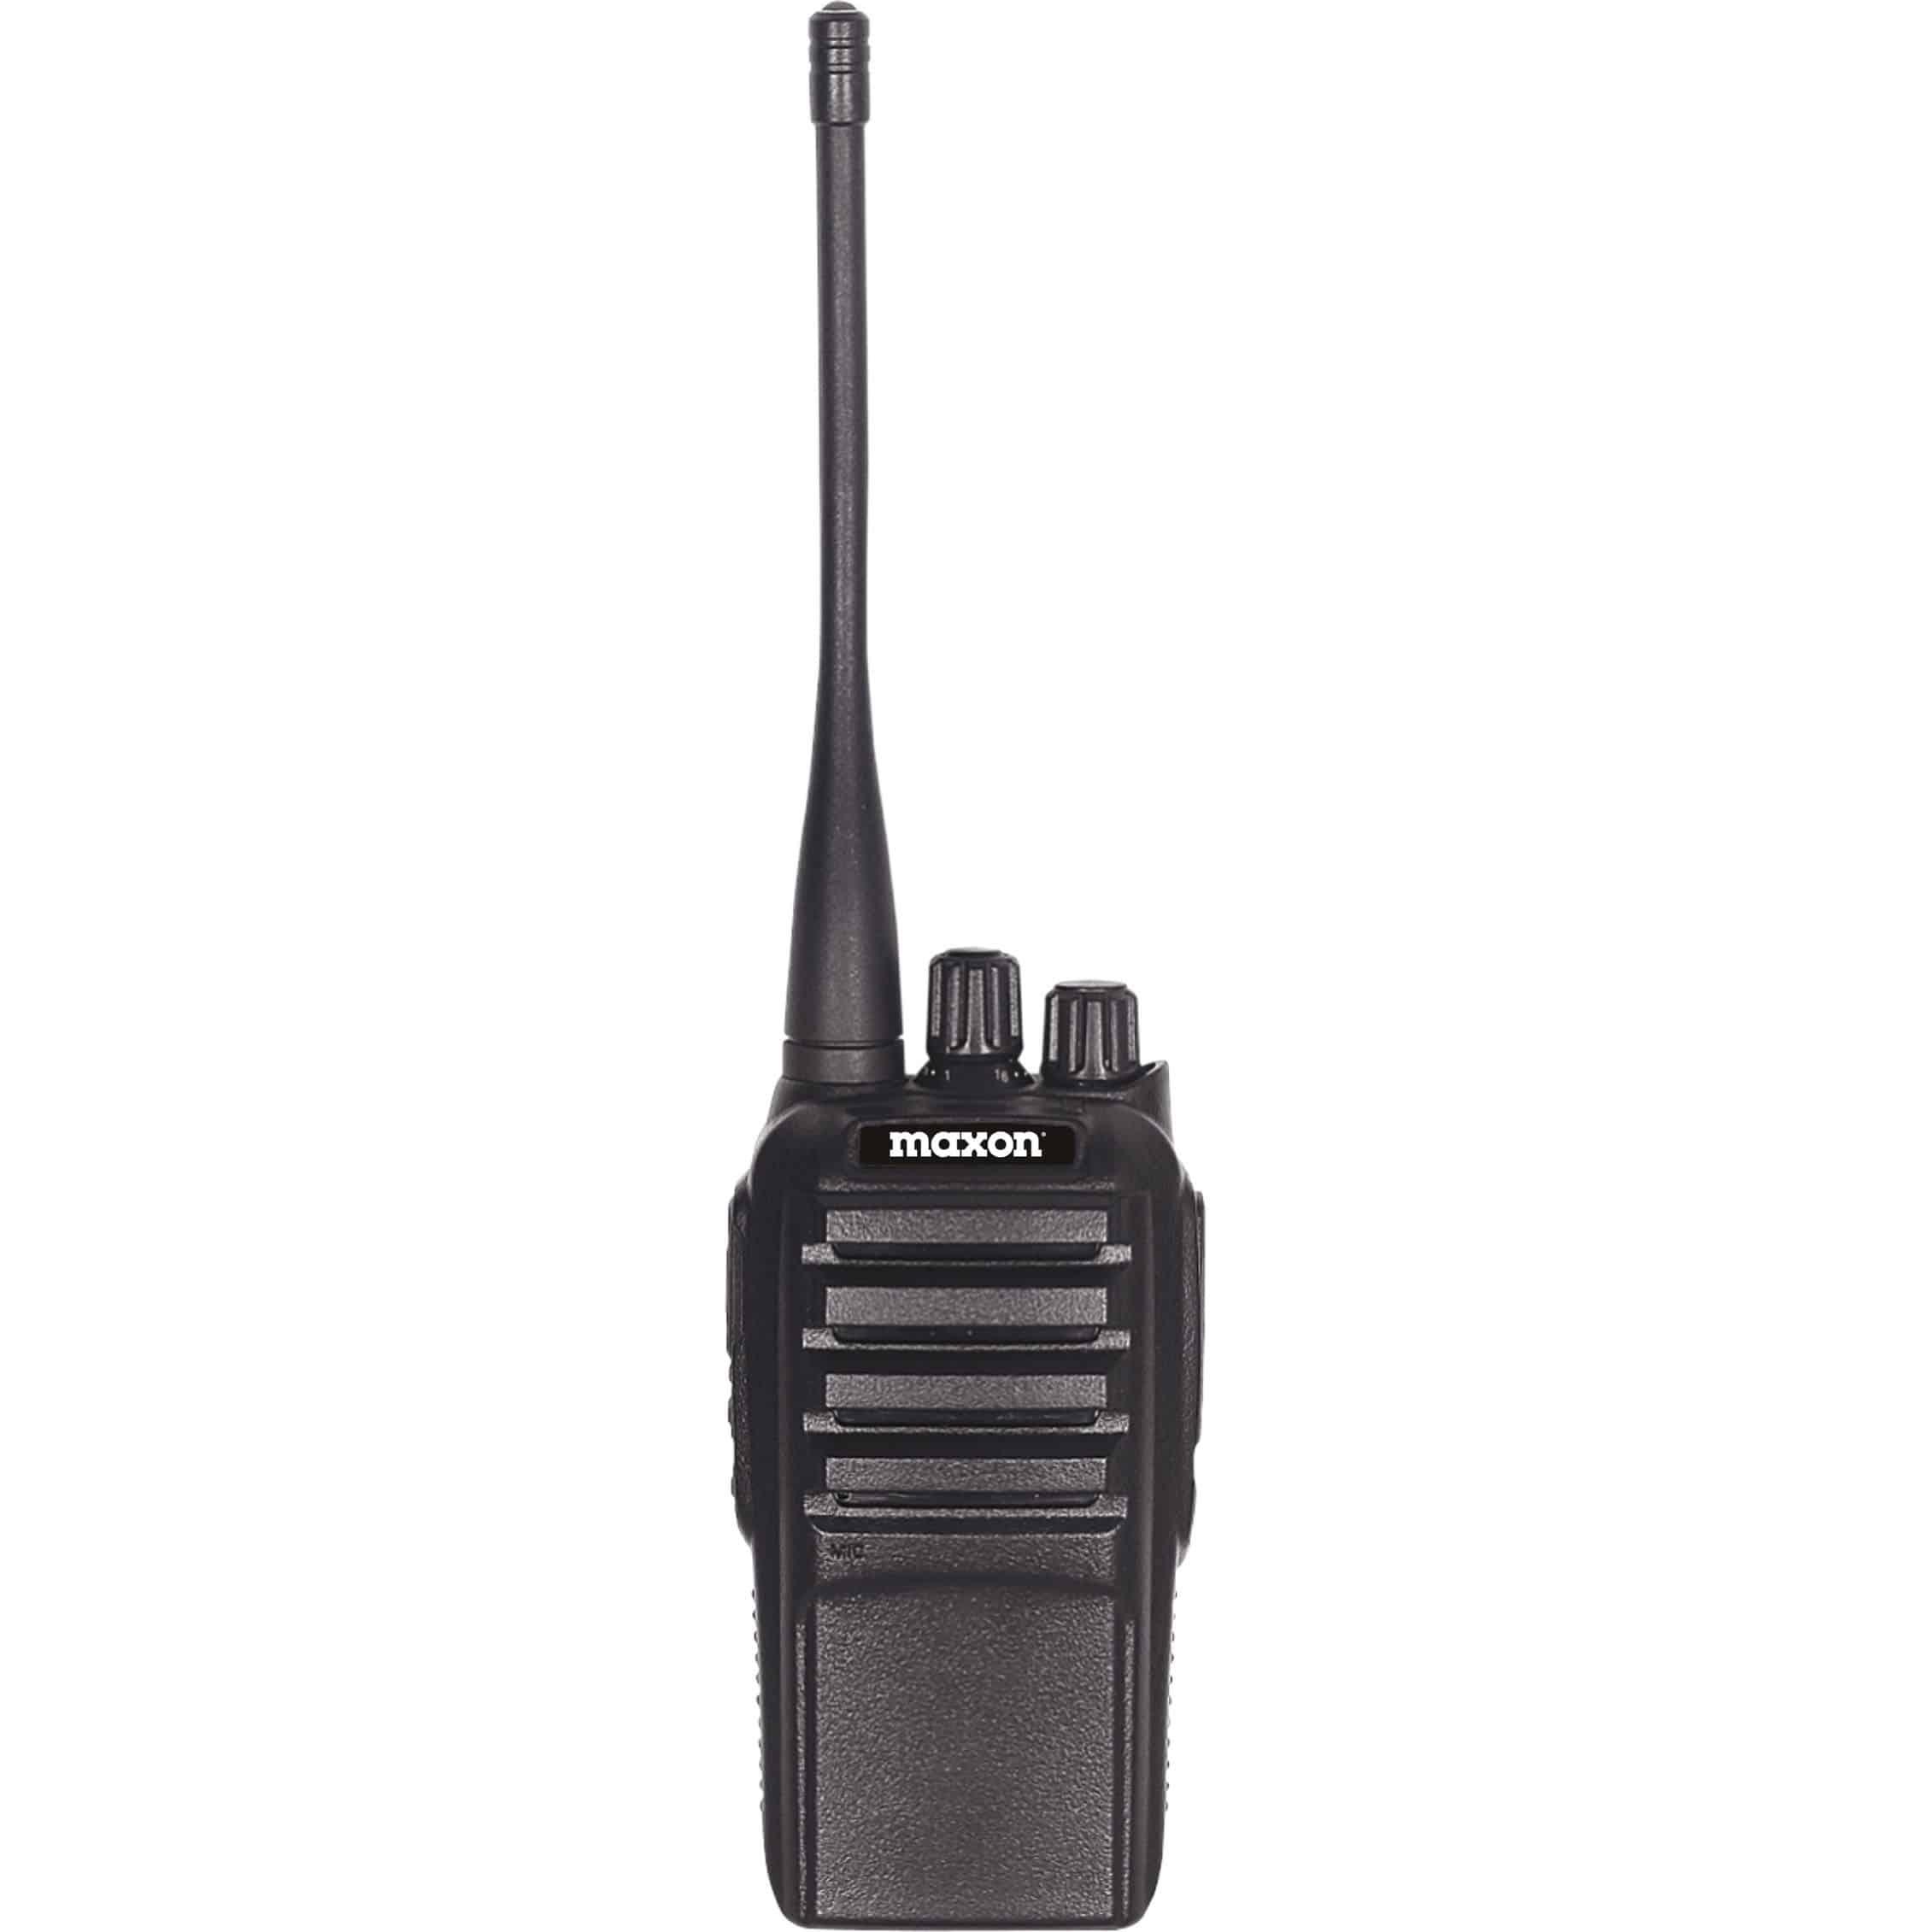 TS3416 - Maxon Professional Handheld UHF Radio